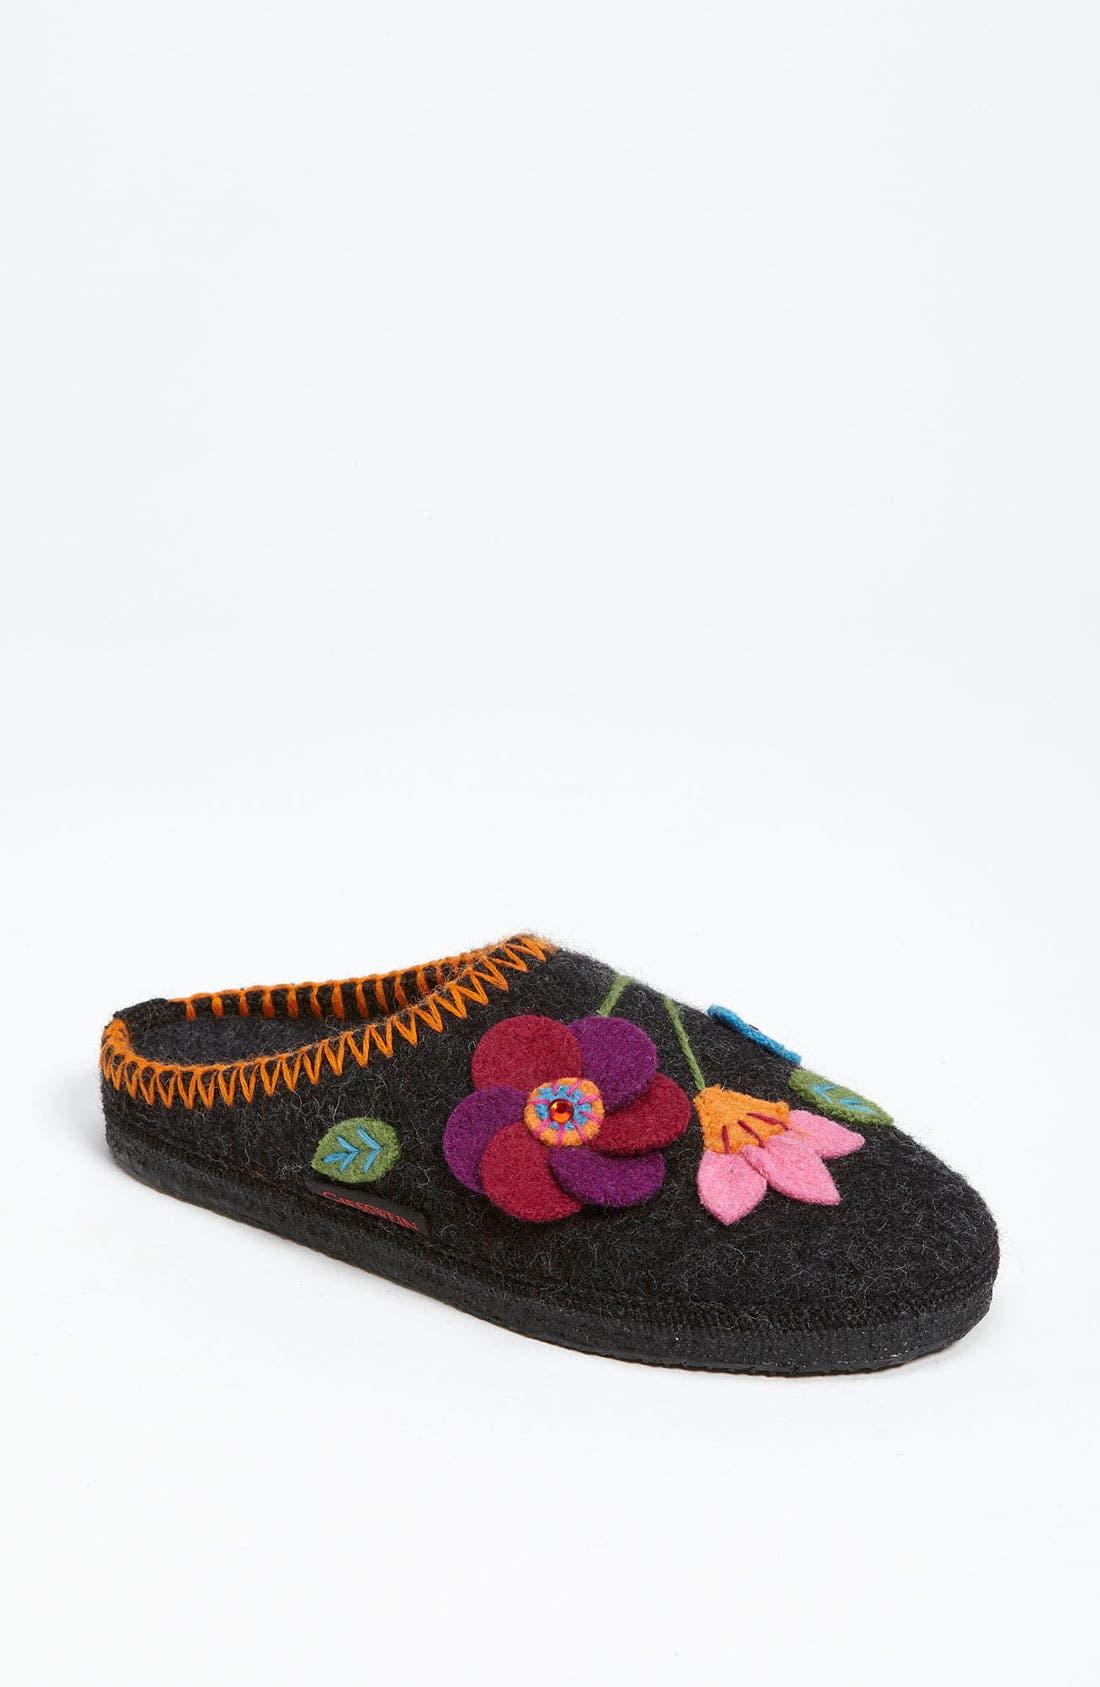 Alternate Image 1 Selected - Giesswein 'Vienna Flower' Slipper